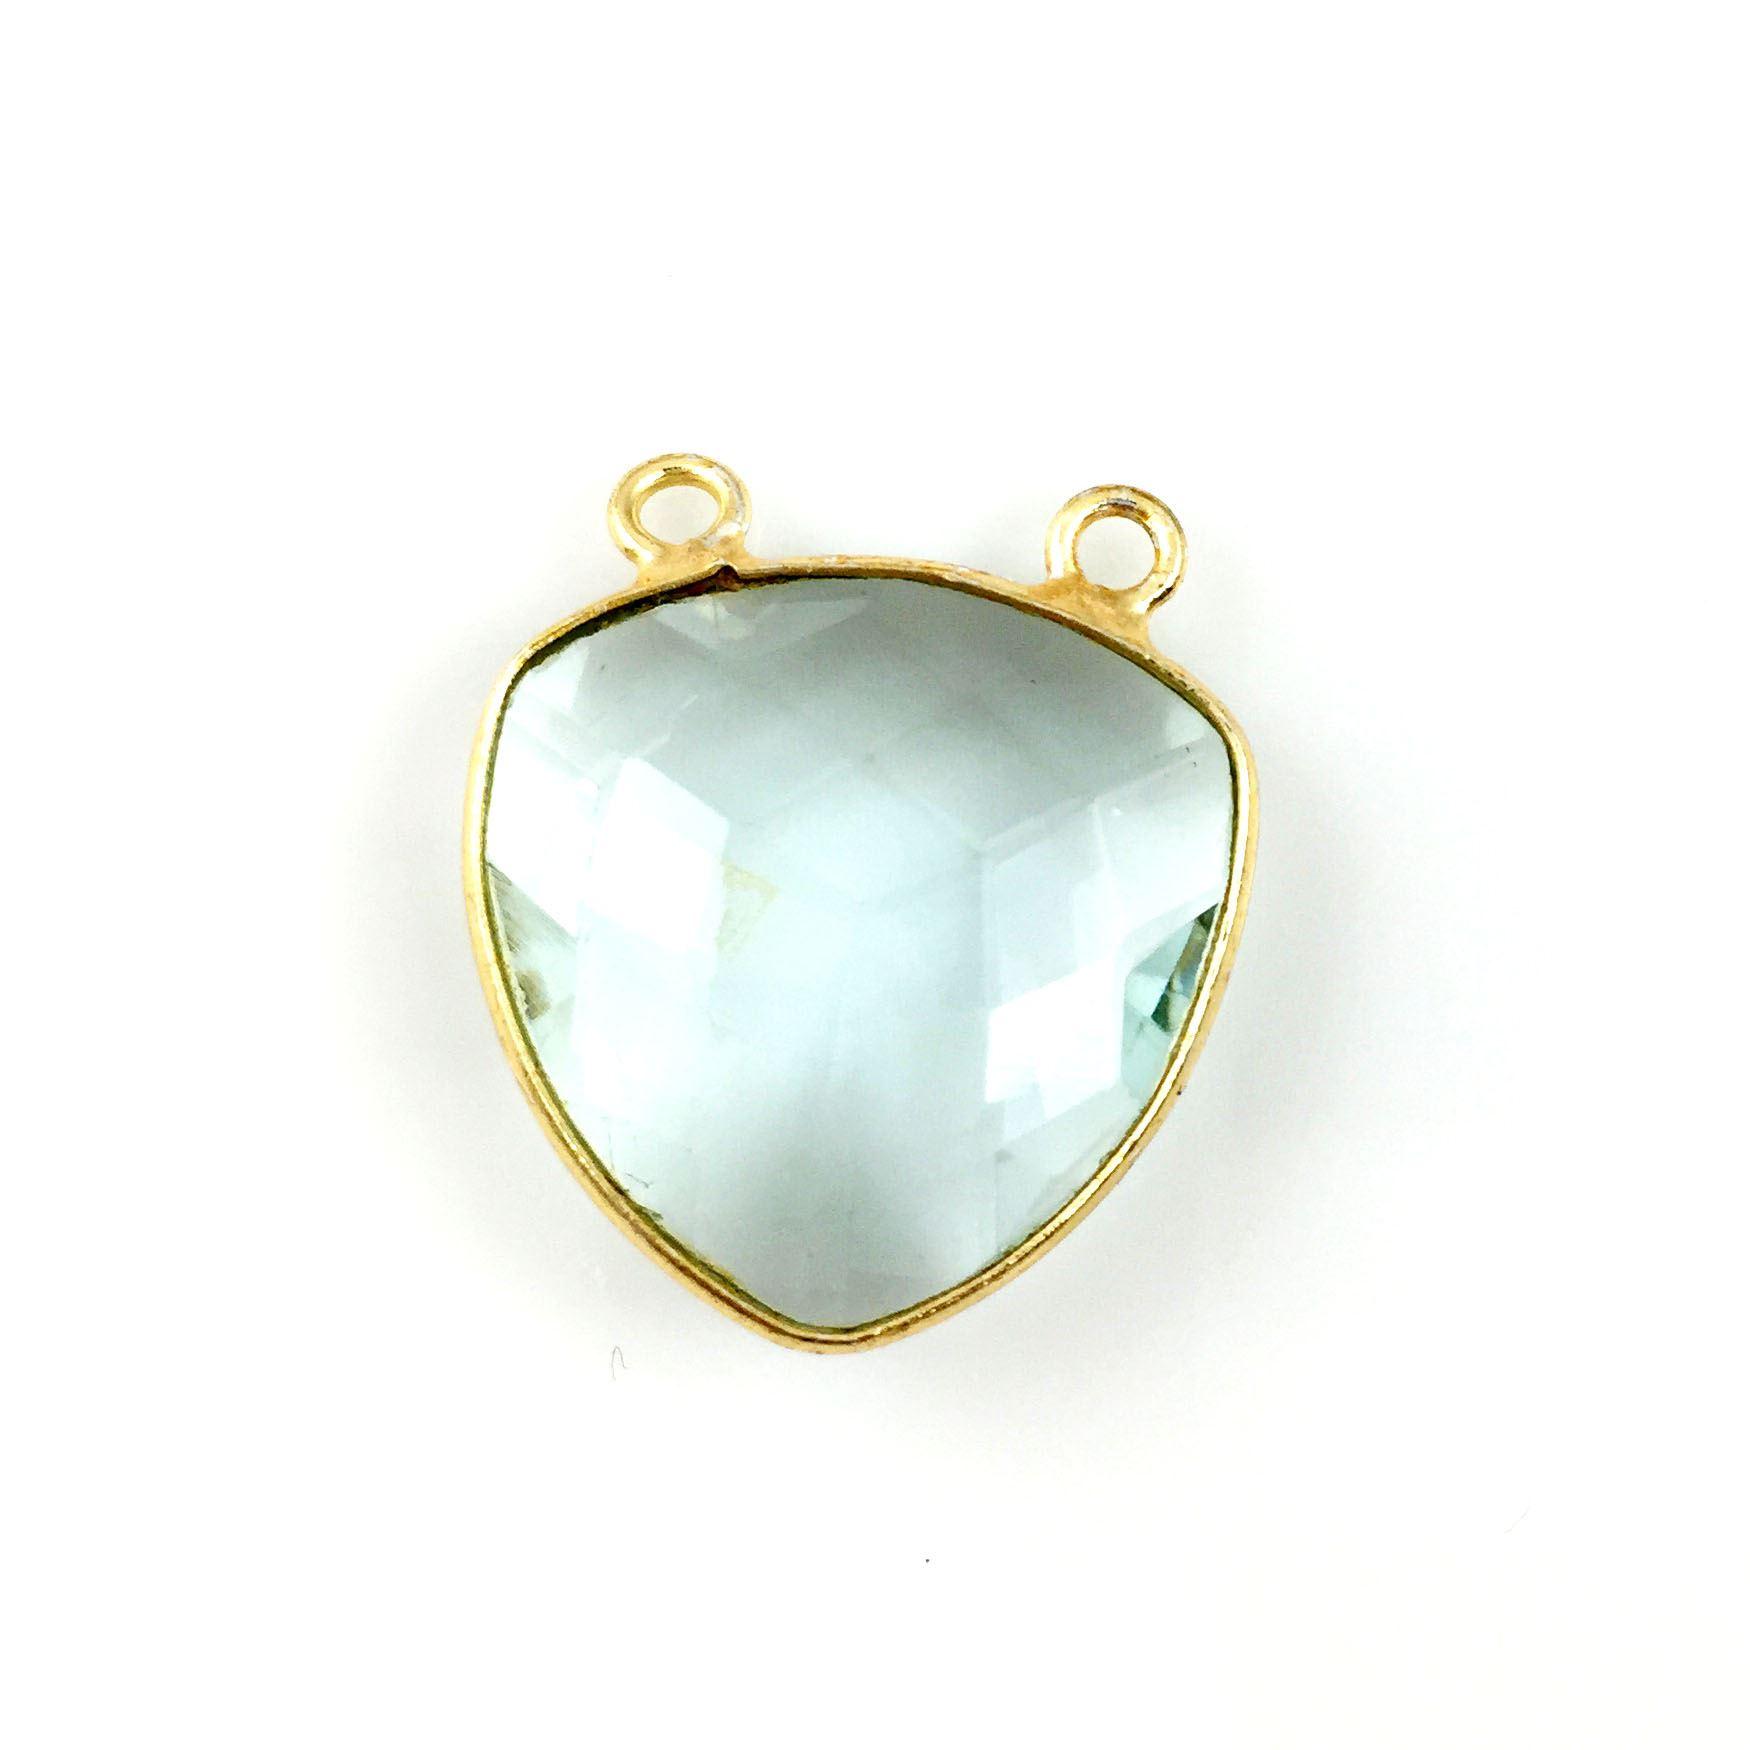 Bezel Gemstone Connector Pendant - Aqua Quartz - Gold plated Sterling Silver - Large Trillion Shaped Faceted - 18 mm - 1 piece